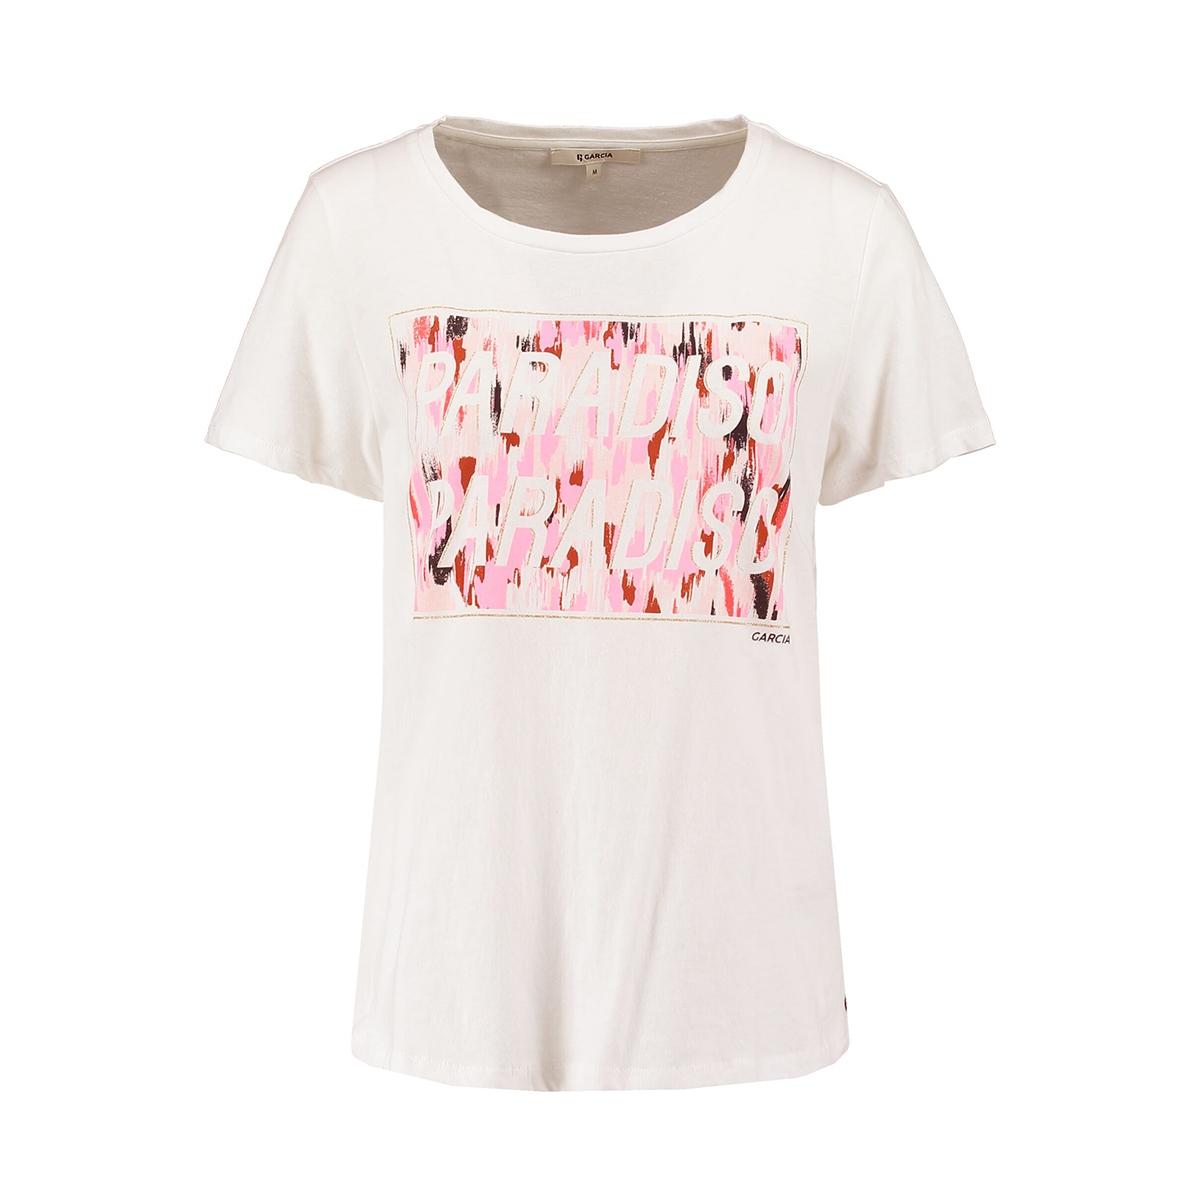 t shirt met opdruk q00007 garcia t-shirt 53 off white